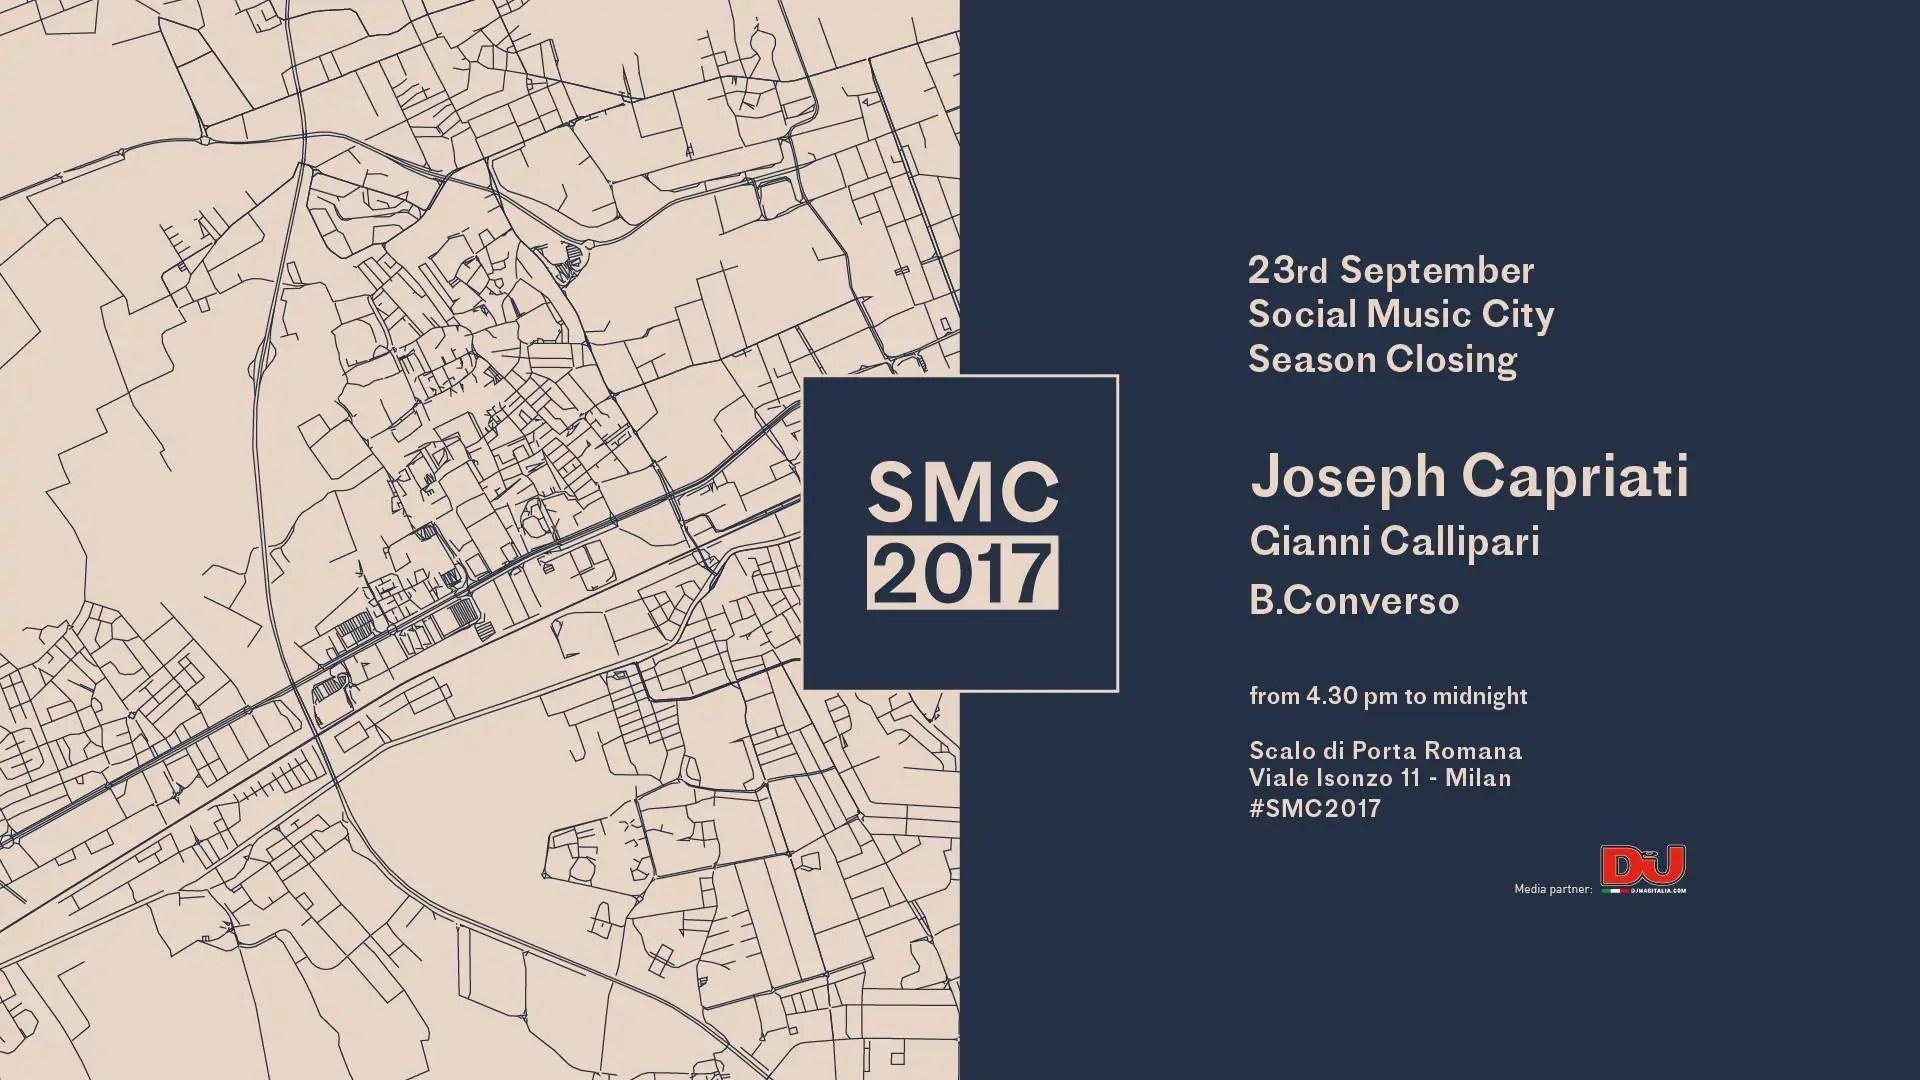 Joseph Capriati Social Music City